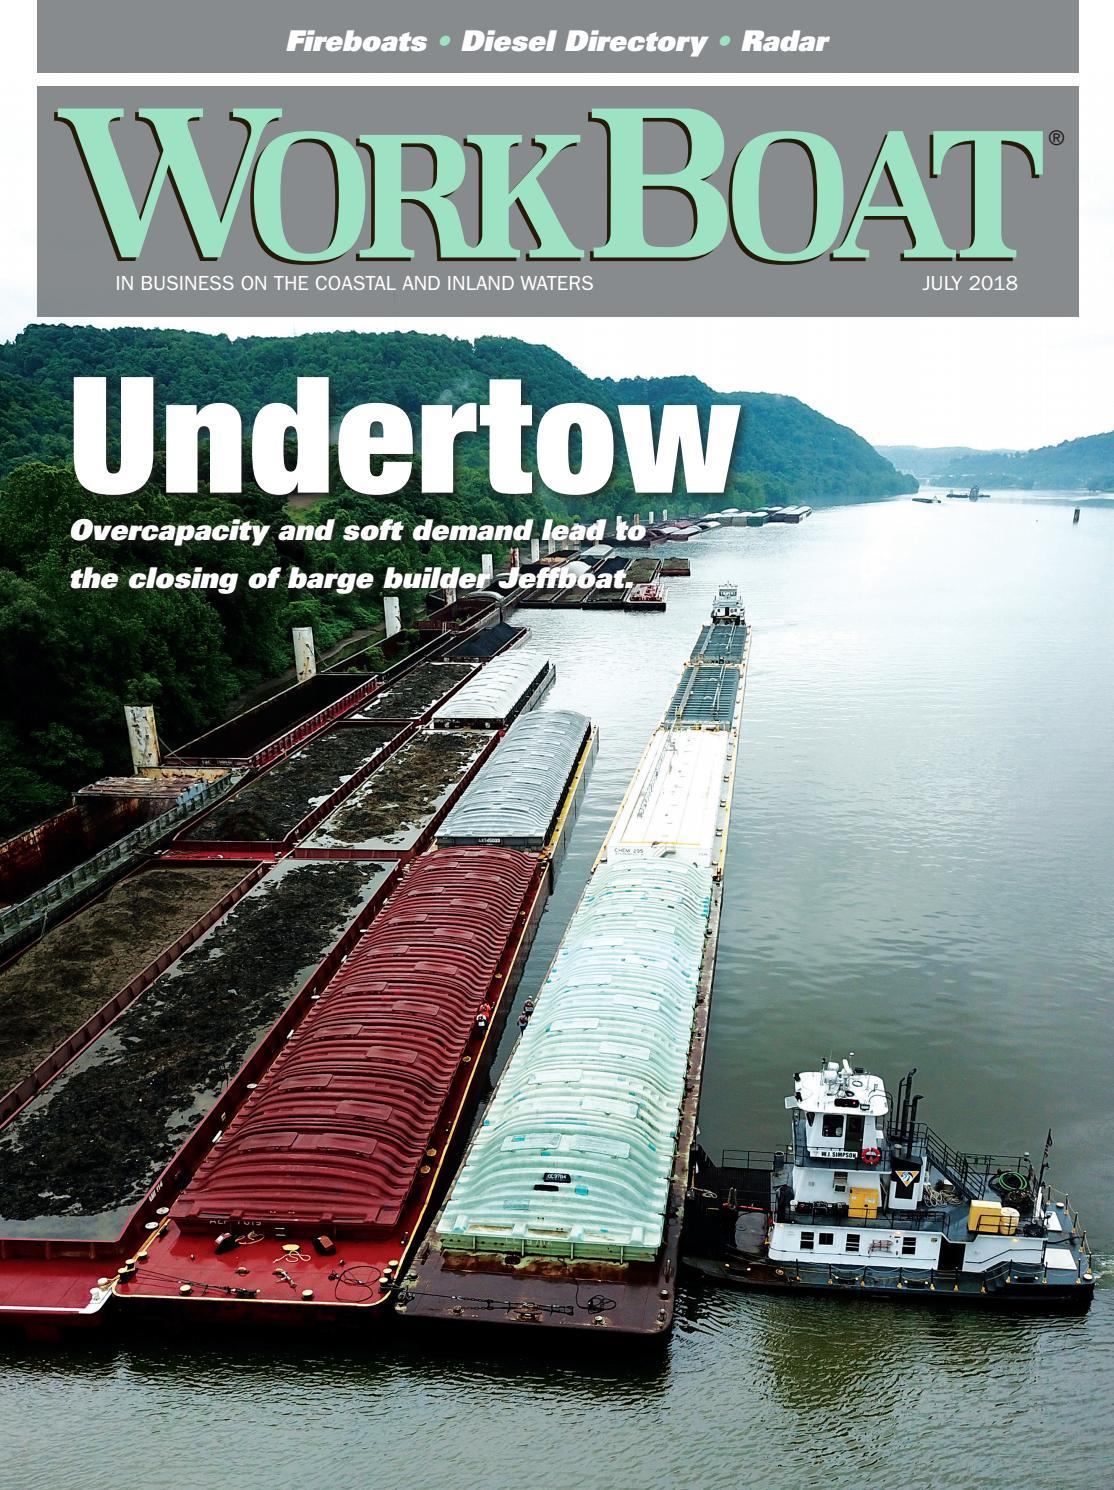 Workboat July 2018 By Magazine Issuu Imo Turbo 32 Gb Biru